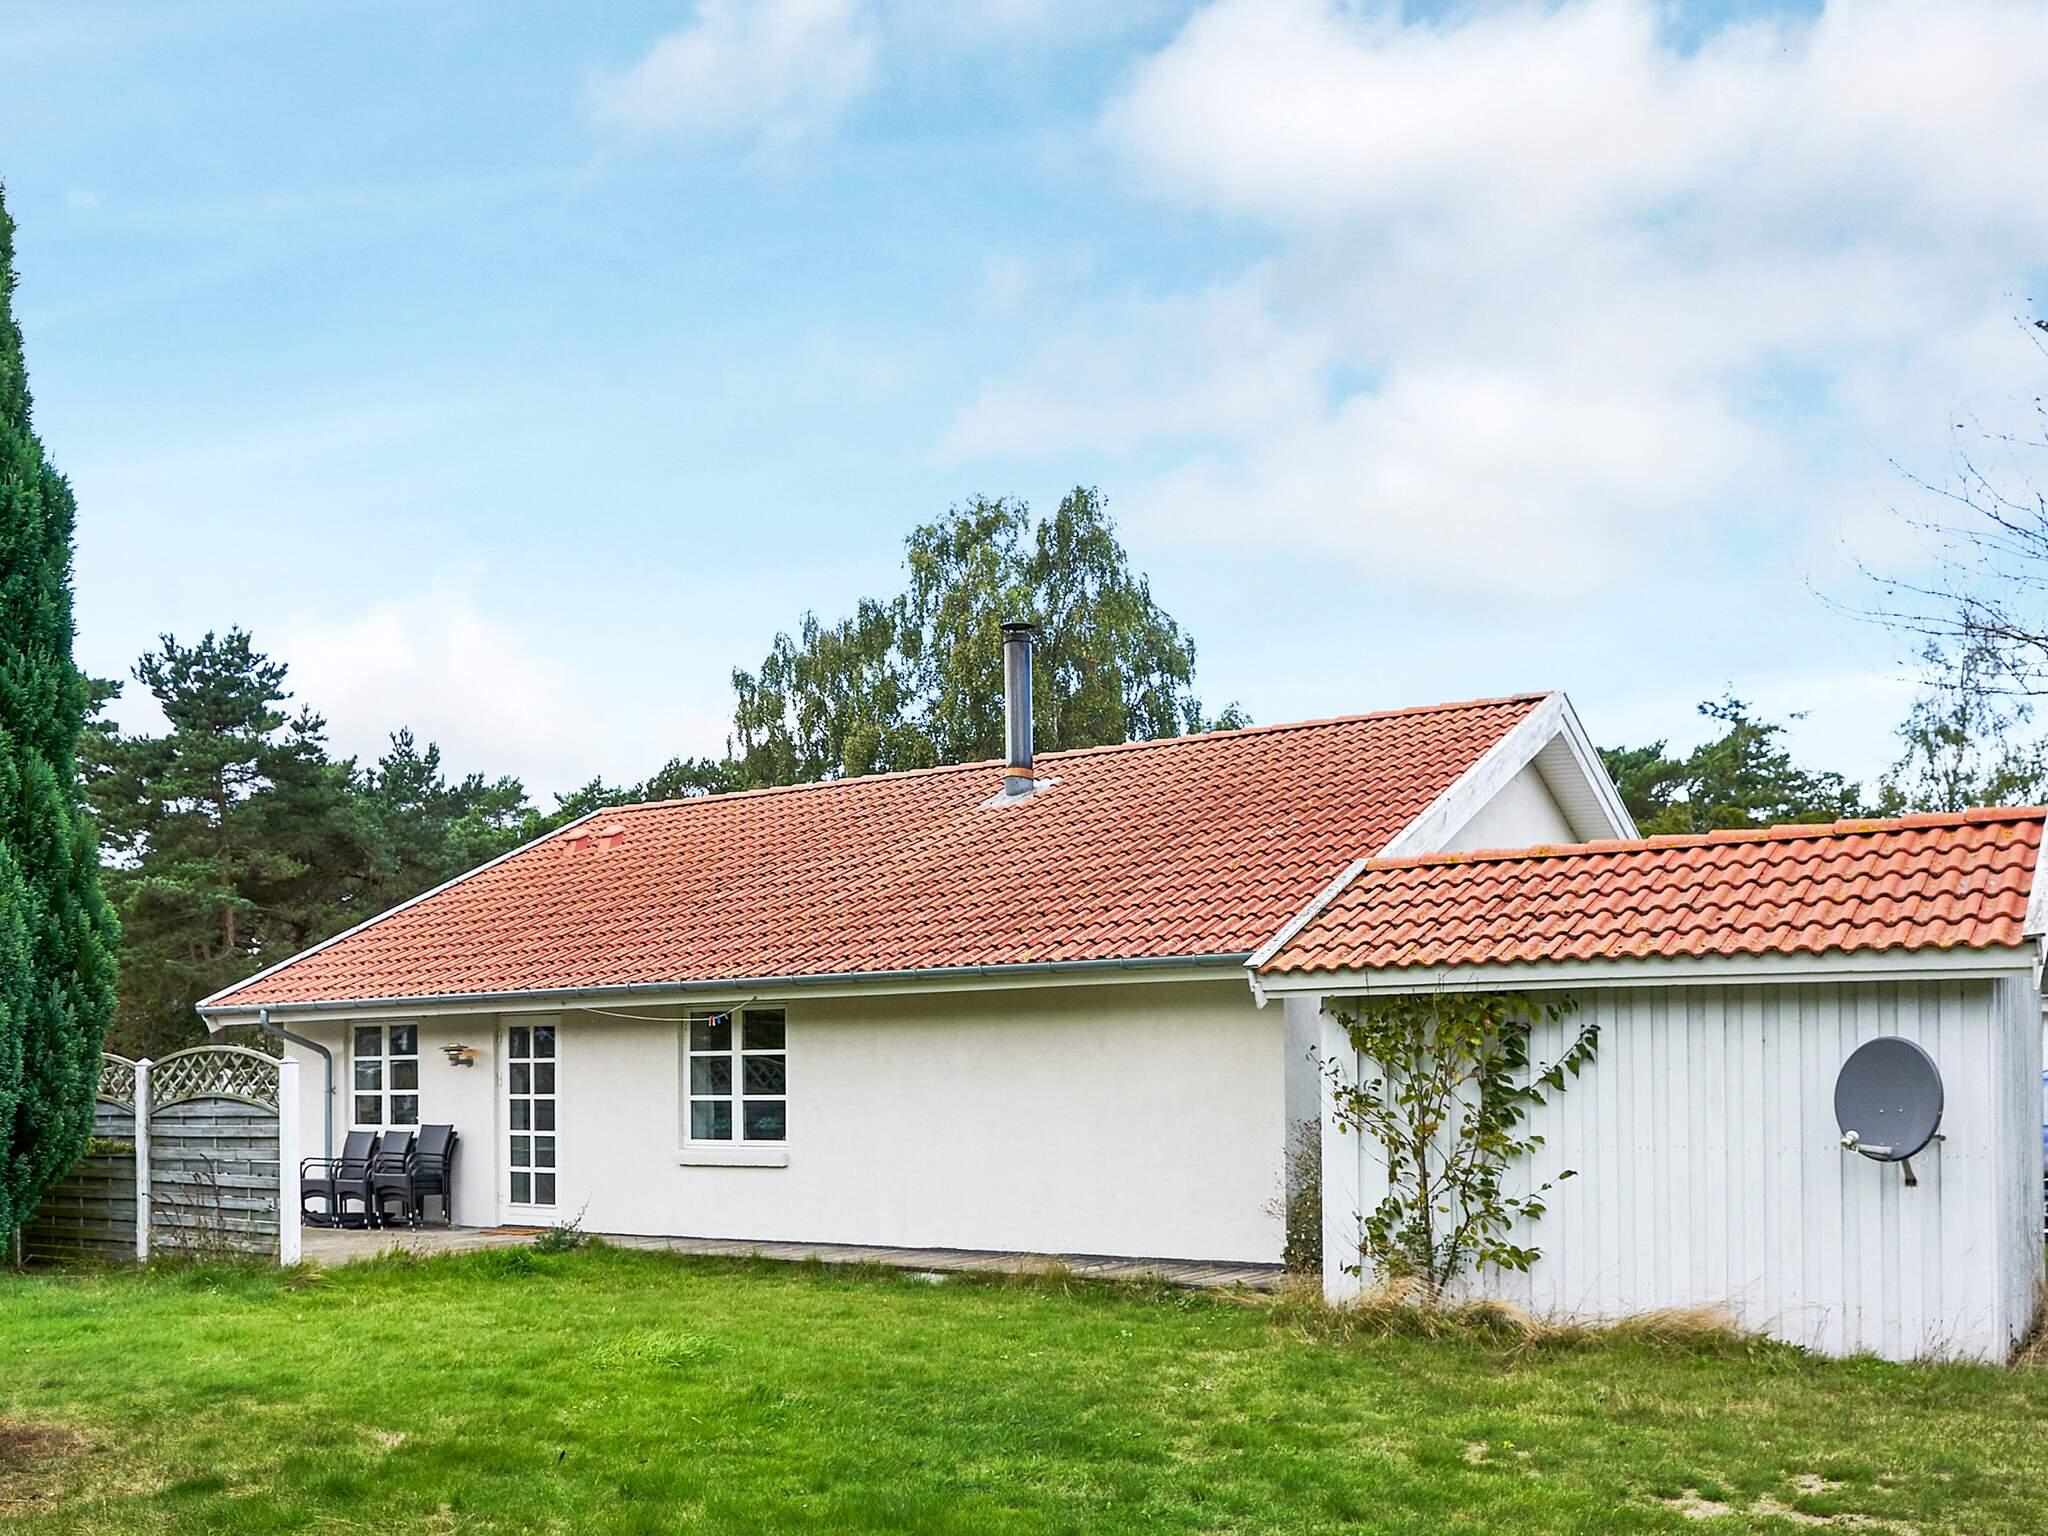 Ferienhaus Balka Strand (135786), Balke, , Bornholm, Dänemark, Bild 15